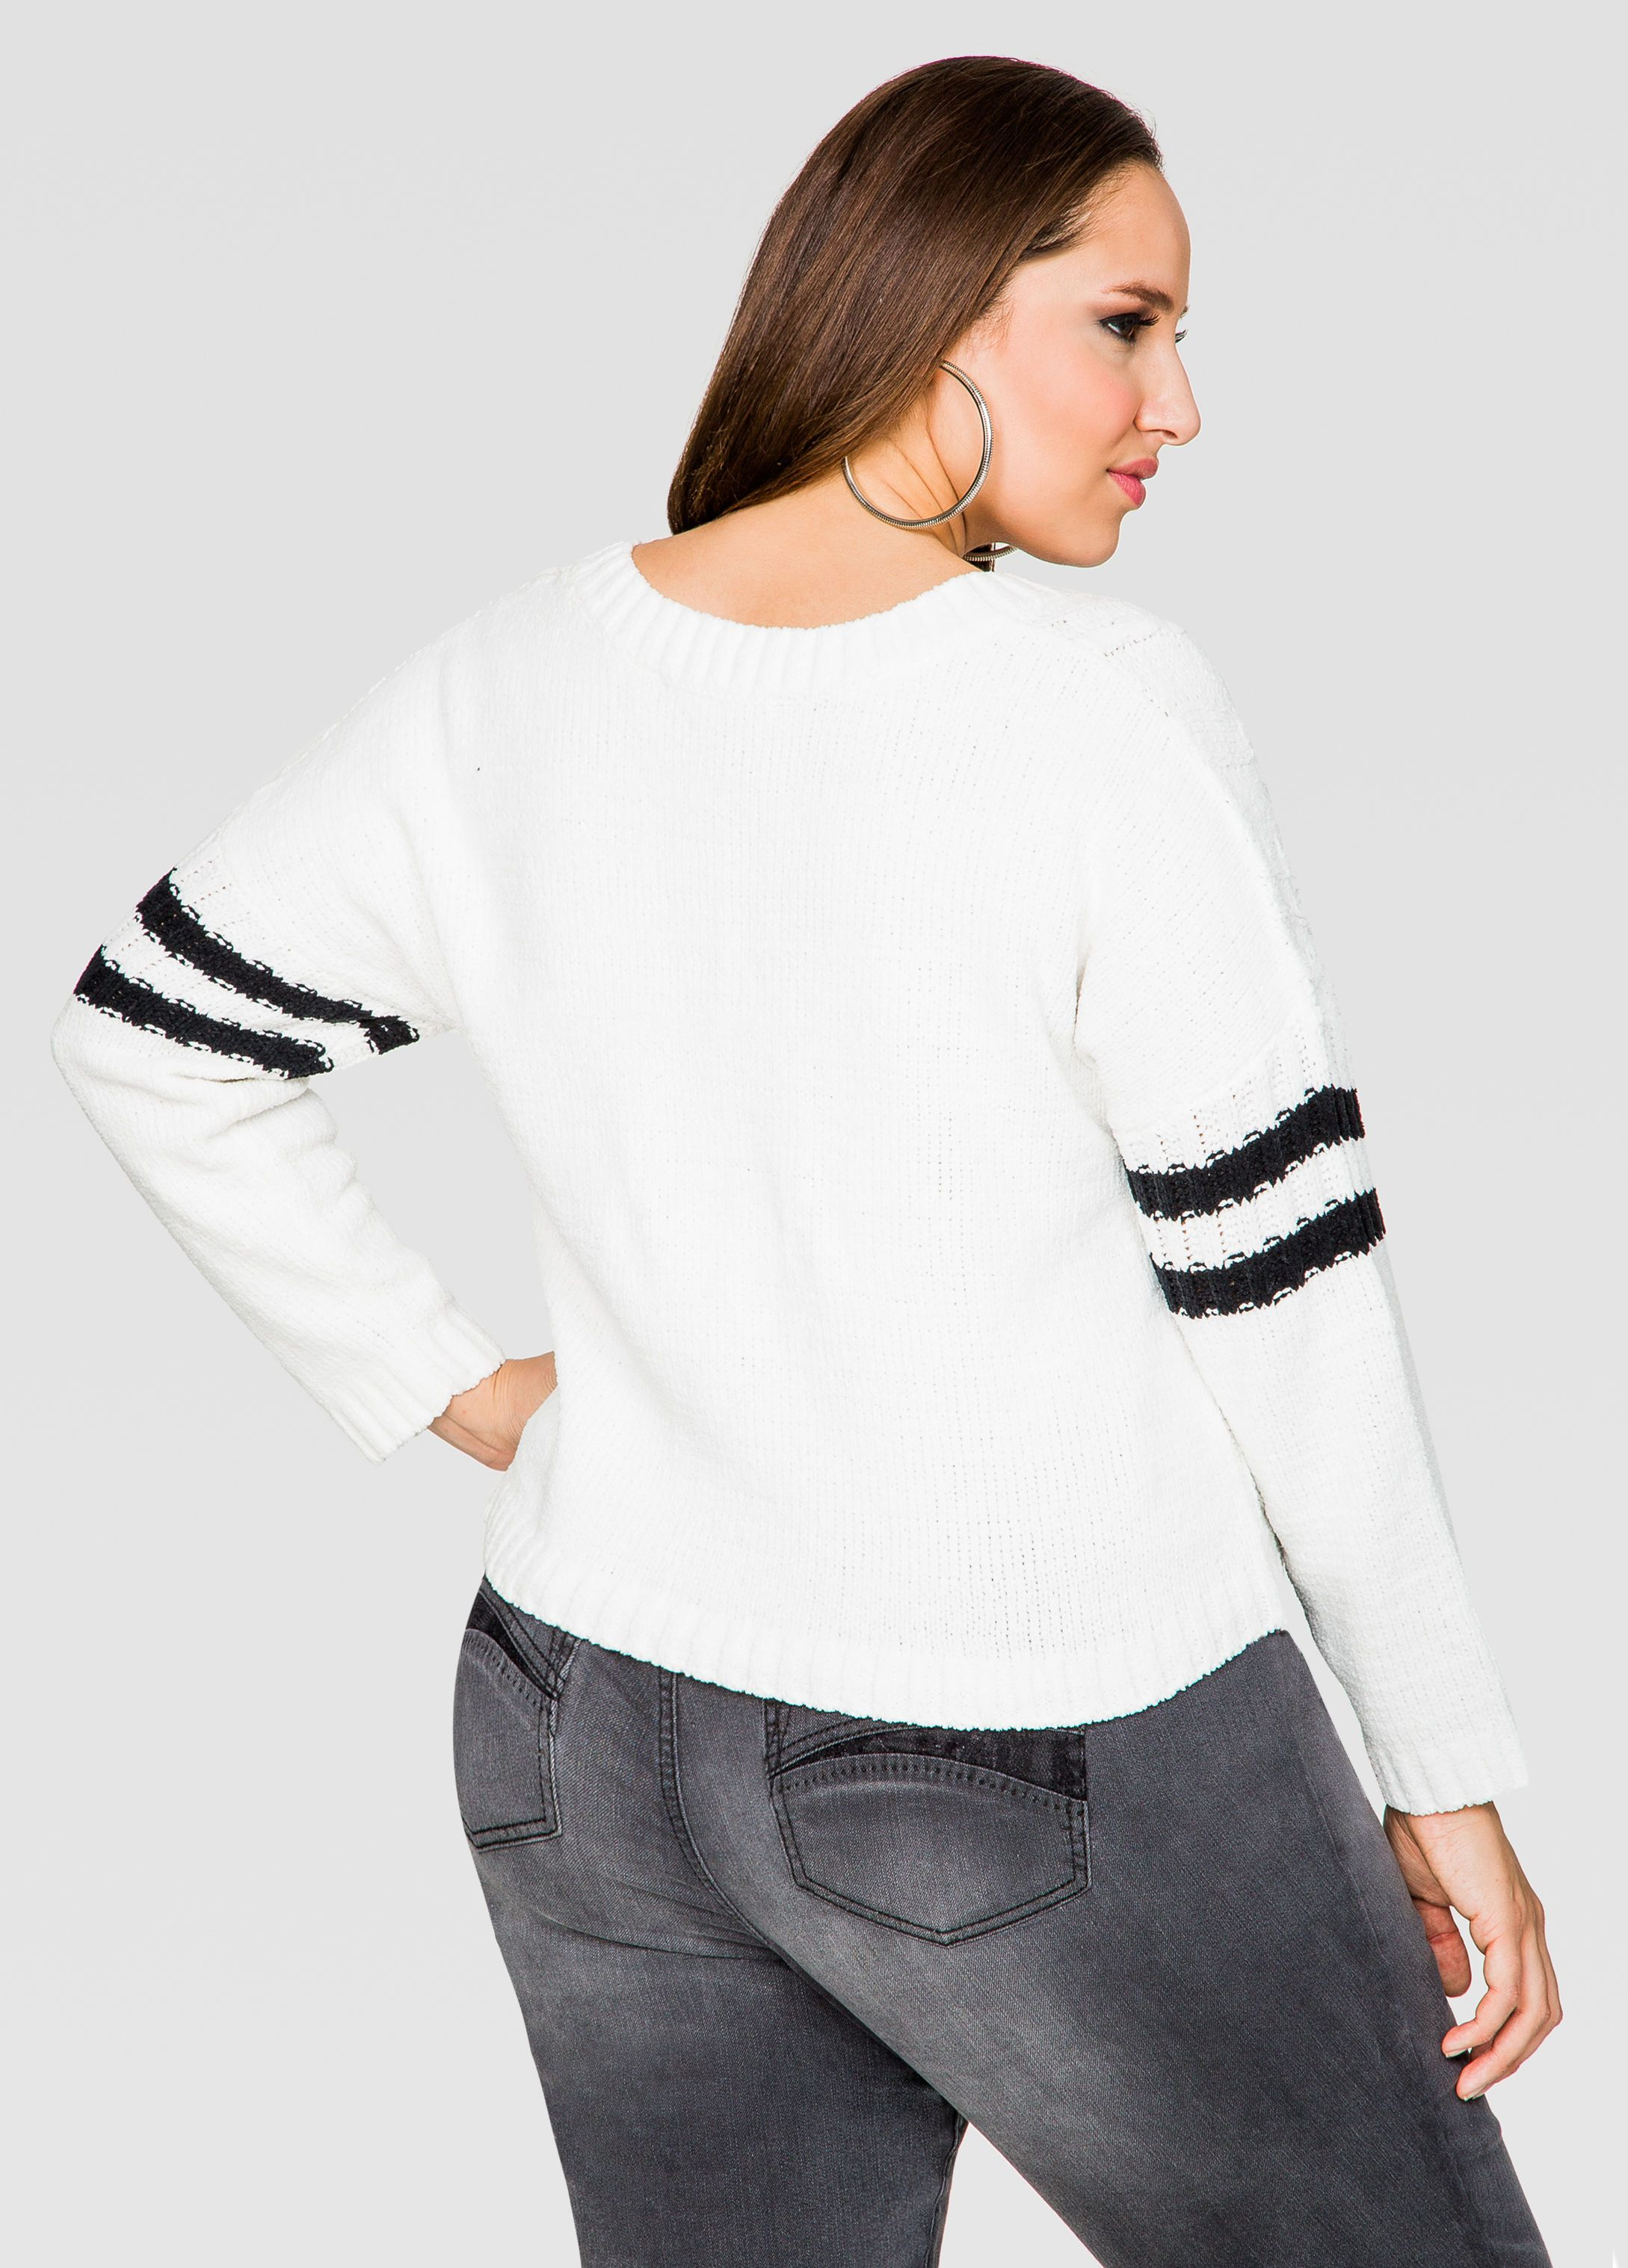 593bdbbebb0 Varsity Stripe Crop Top Sweater - Ashley Stewart. Varsity Stripe Crop Top  Sweater - Ashley Stewart Fashionable Plus Size Clothing ...